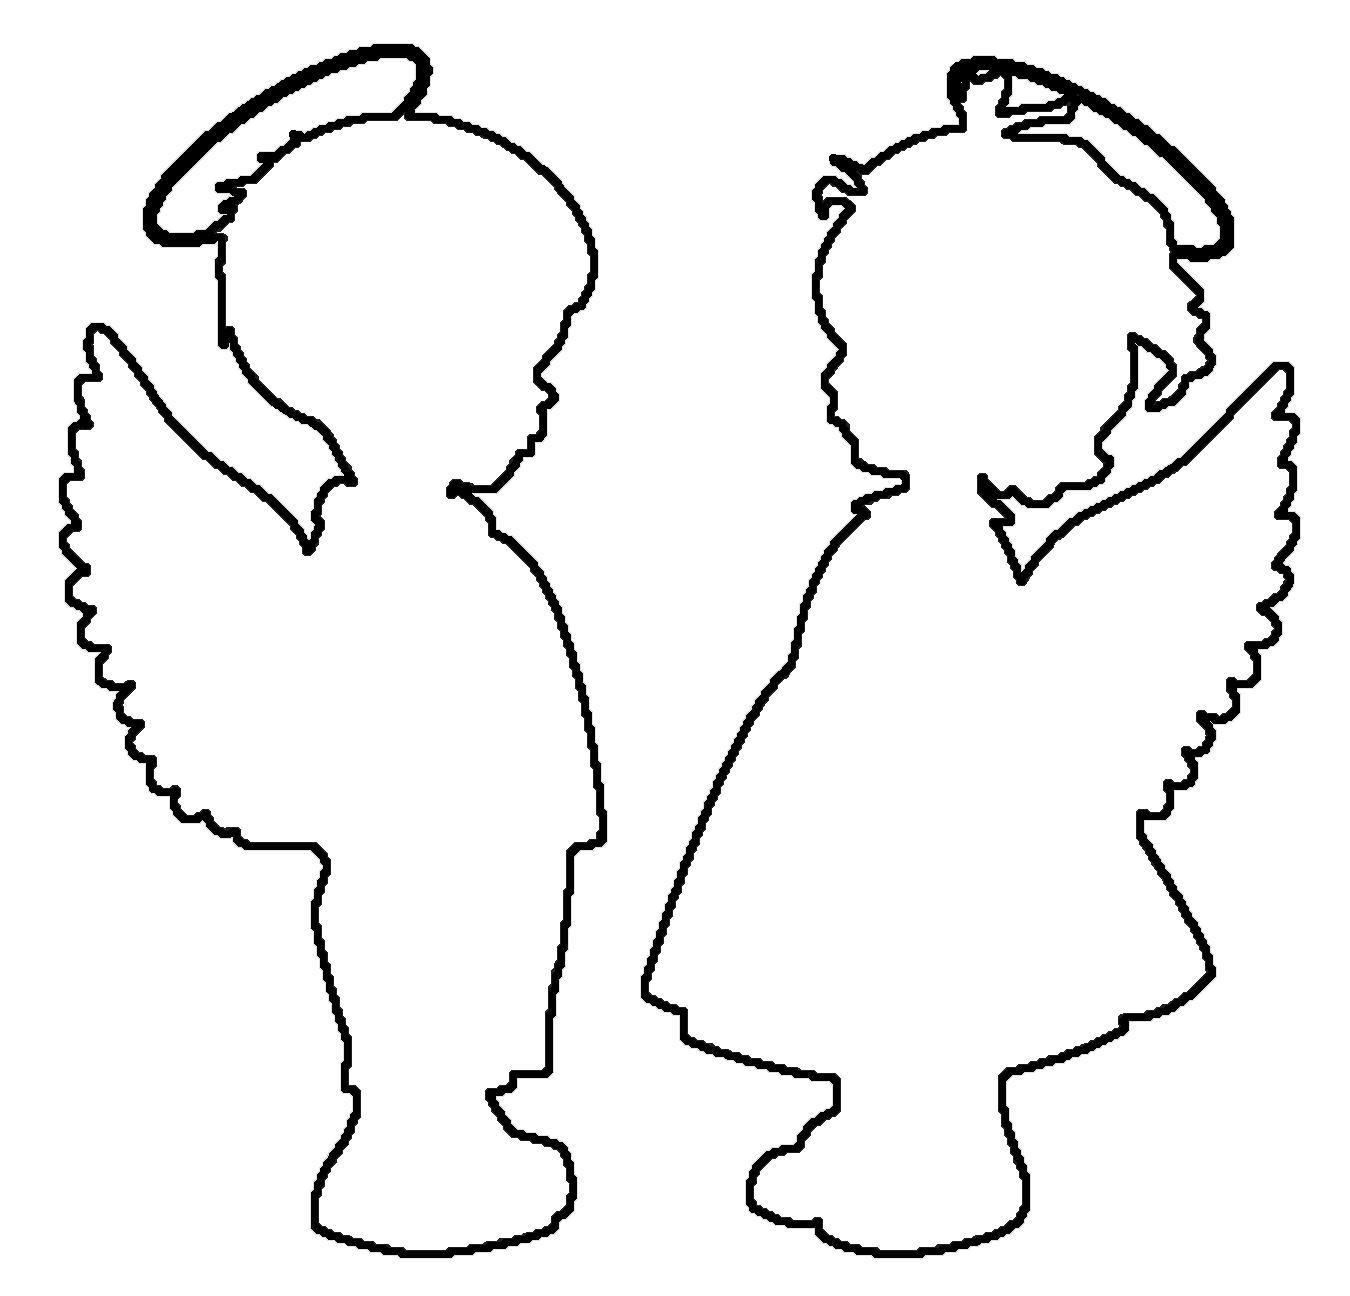 гарантируем вам контур ангел картинки чисто